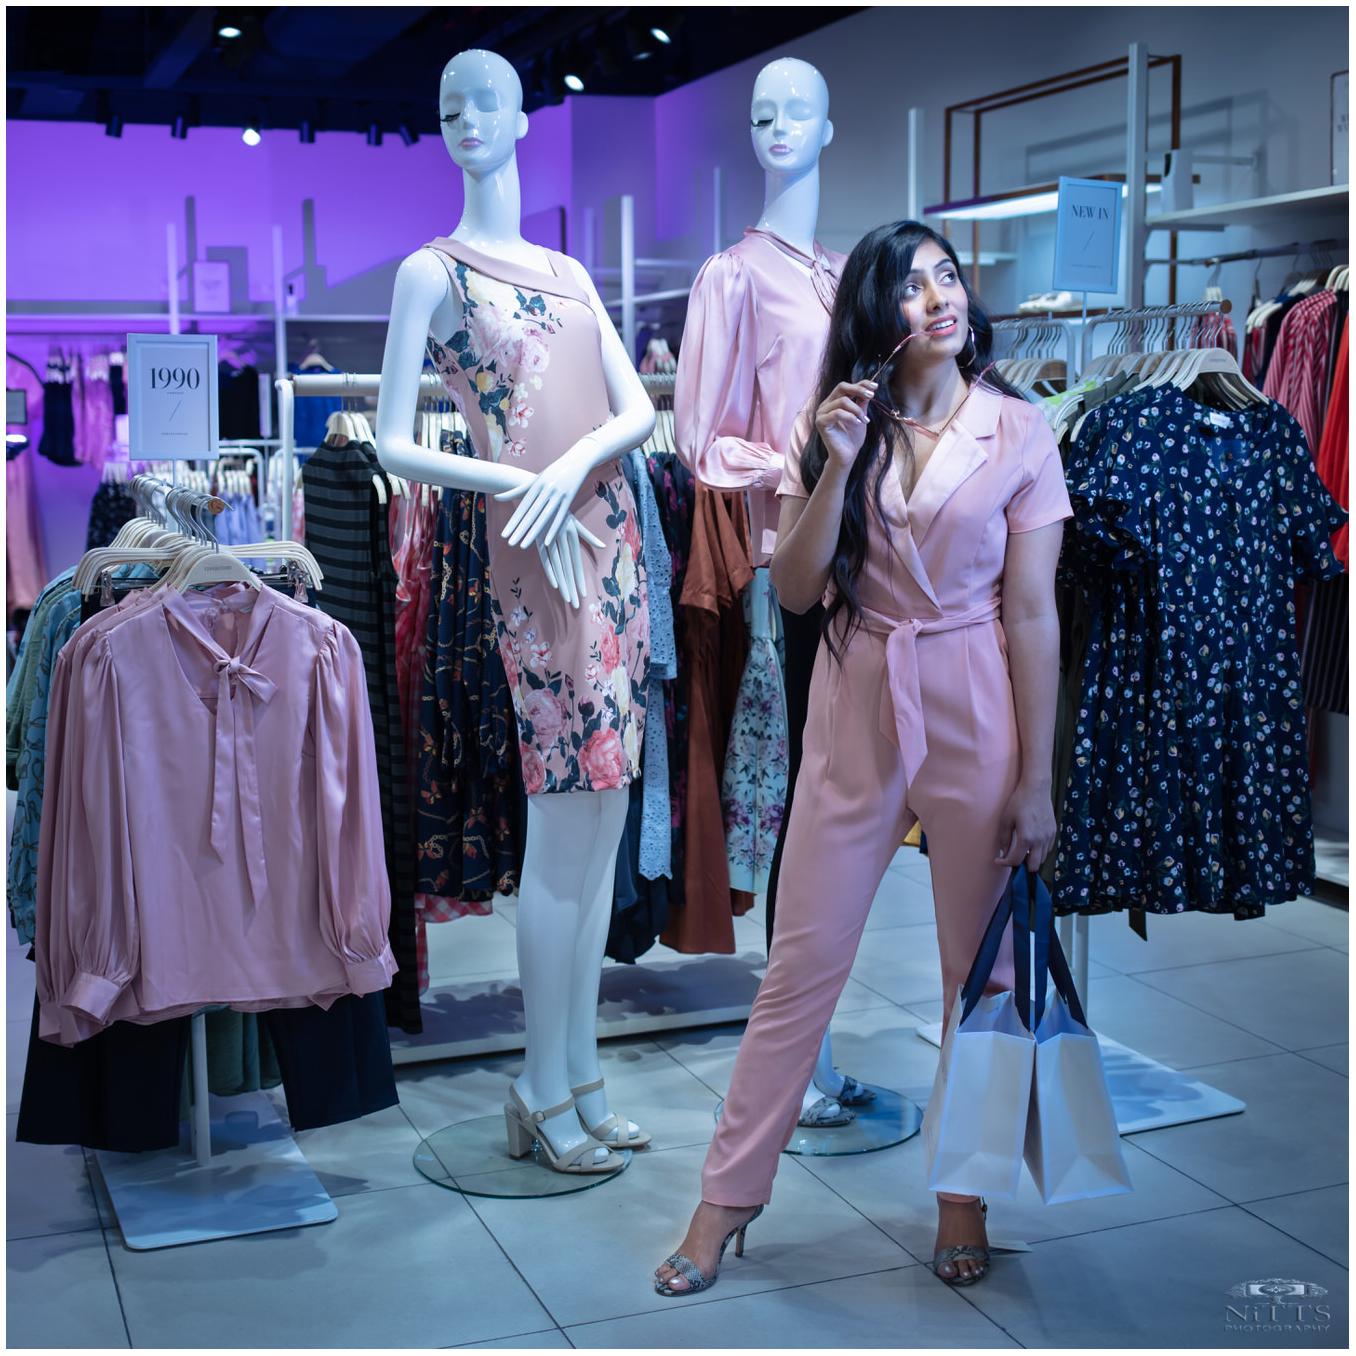 Fashion_Model_Brand_Store Sexy Girl-1.jpg